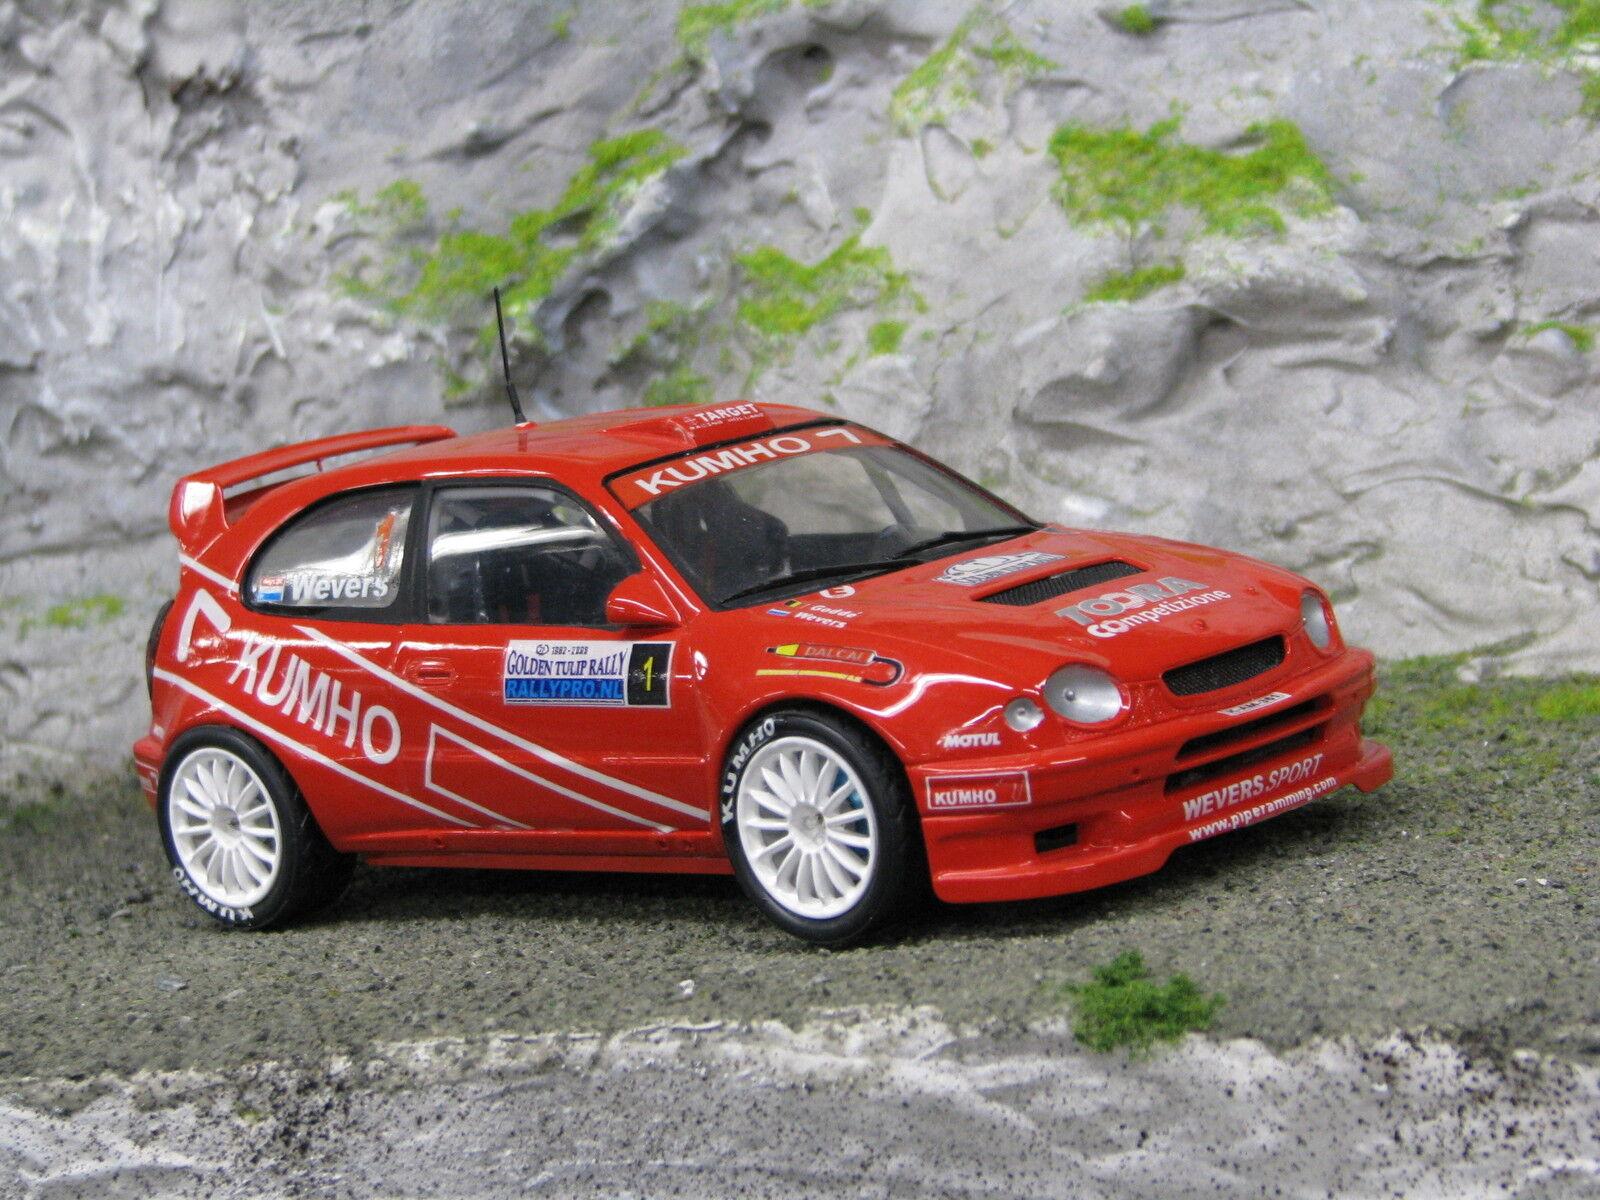 QSP Toyota Corolla WRC 1998 1 24 Wevers   Poel oroen Tulip Rally 2006